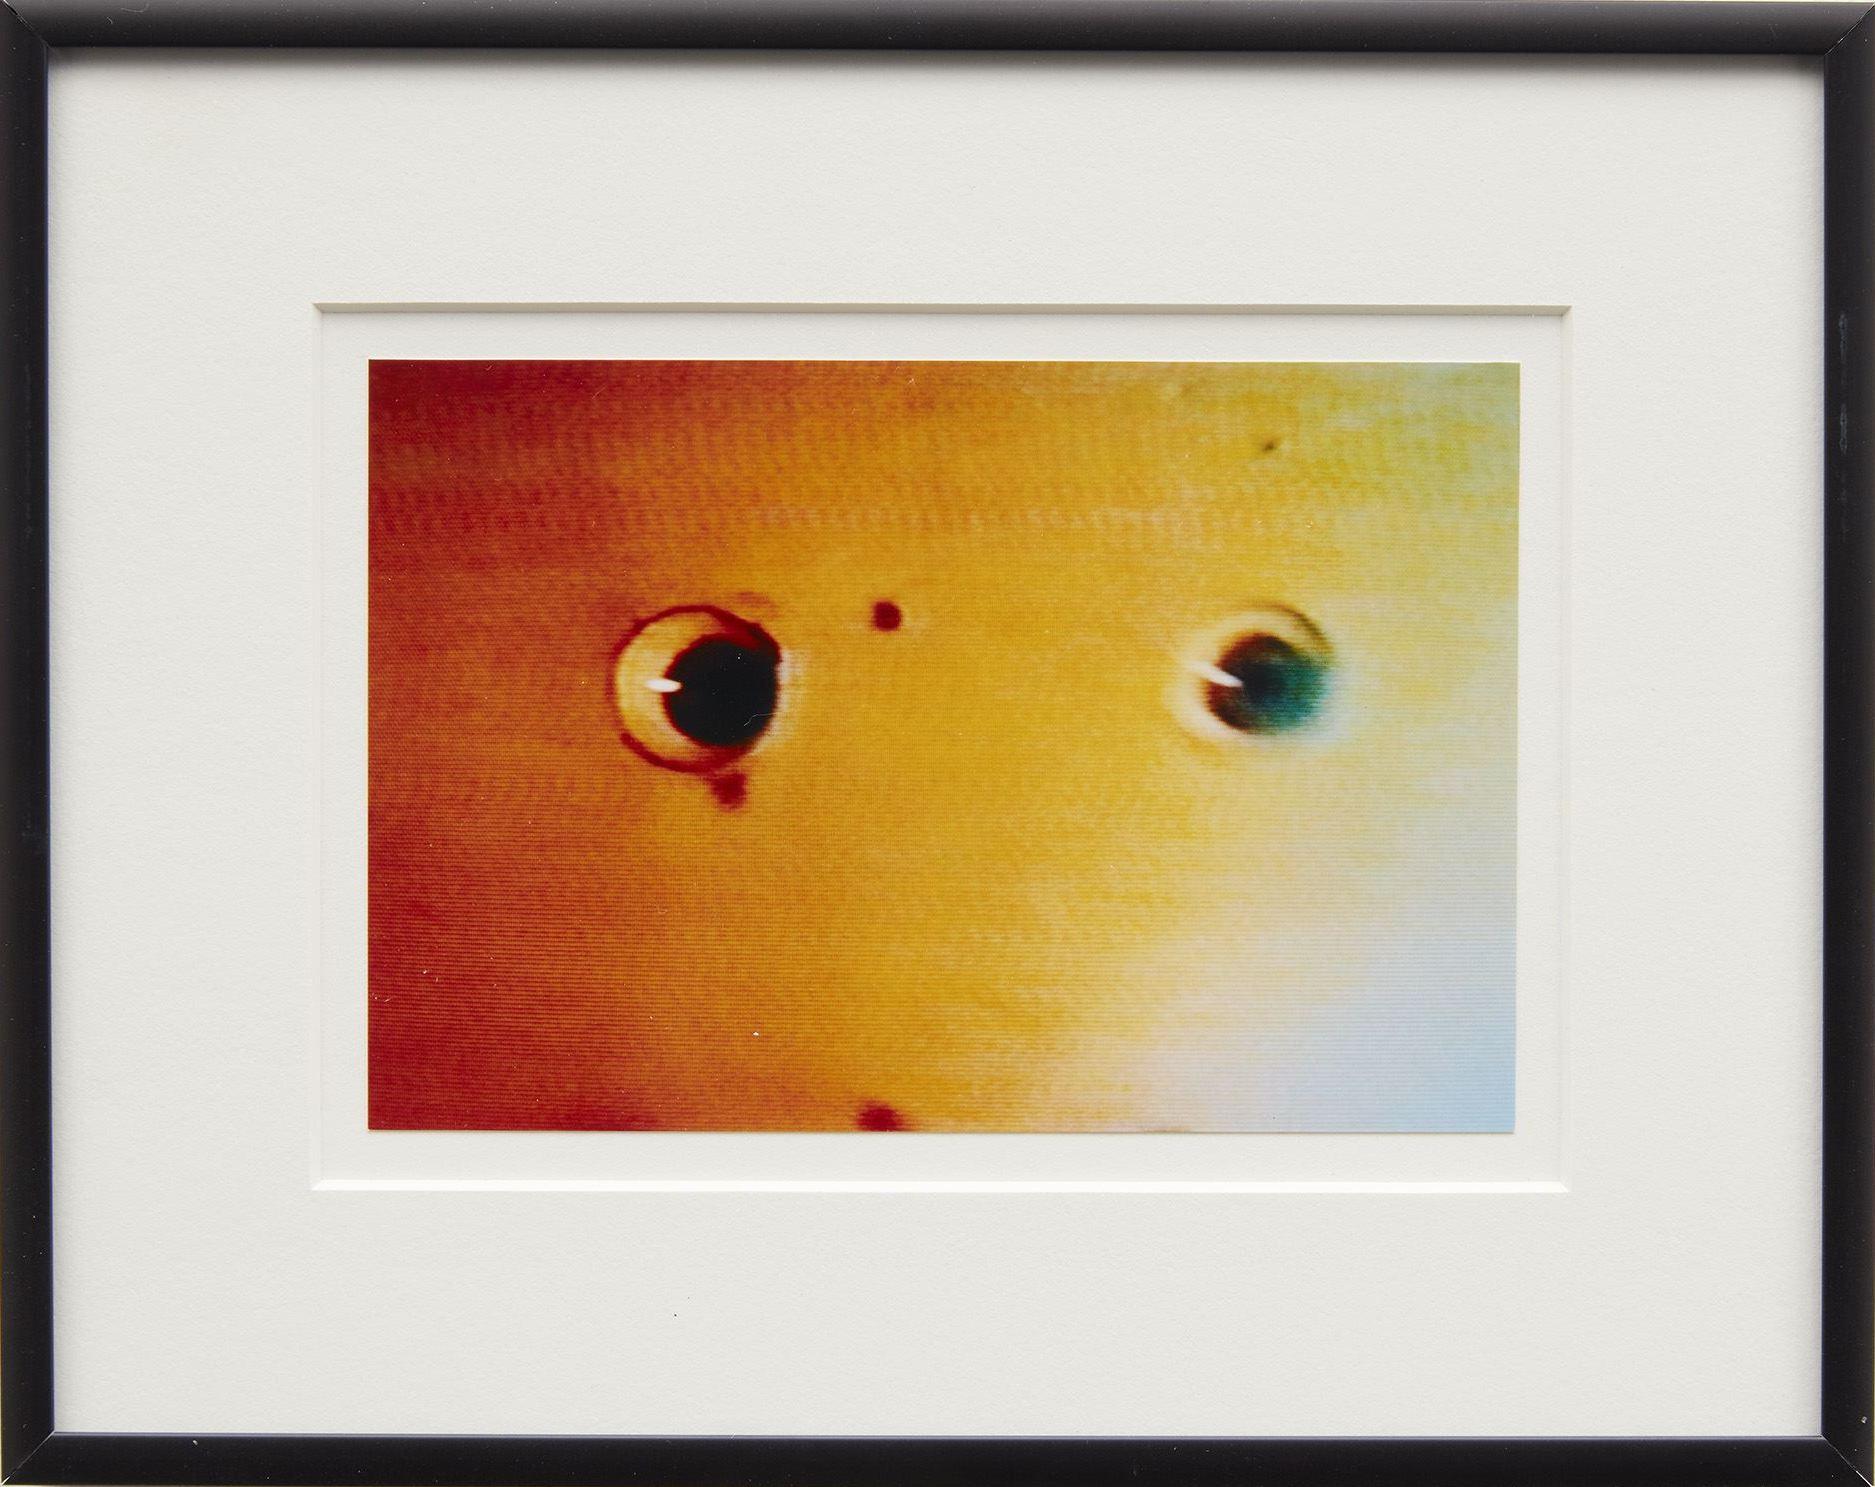 Reckless Eyeballs, 2006